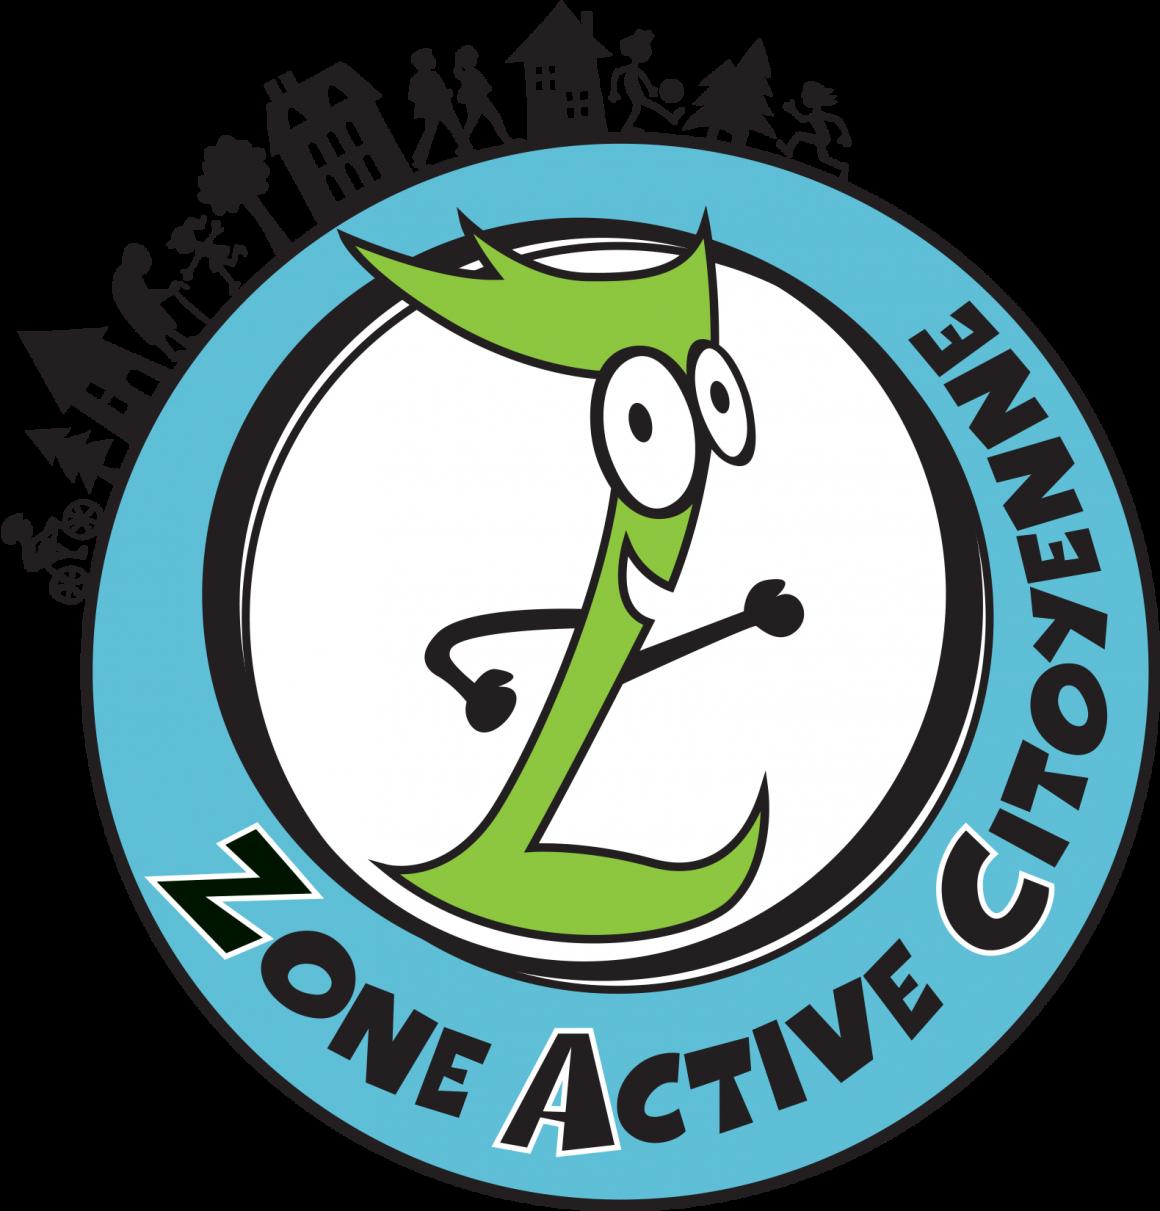 QUARTIER ZONE ACTIVE CITOYENNE (ZAC)